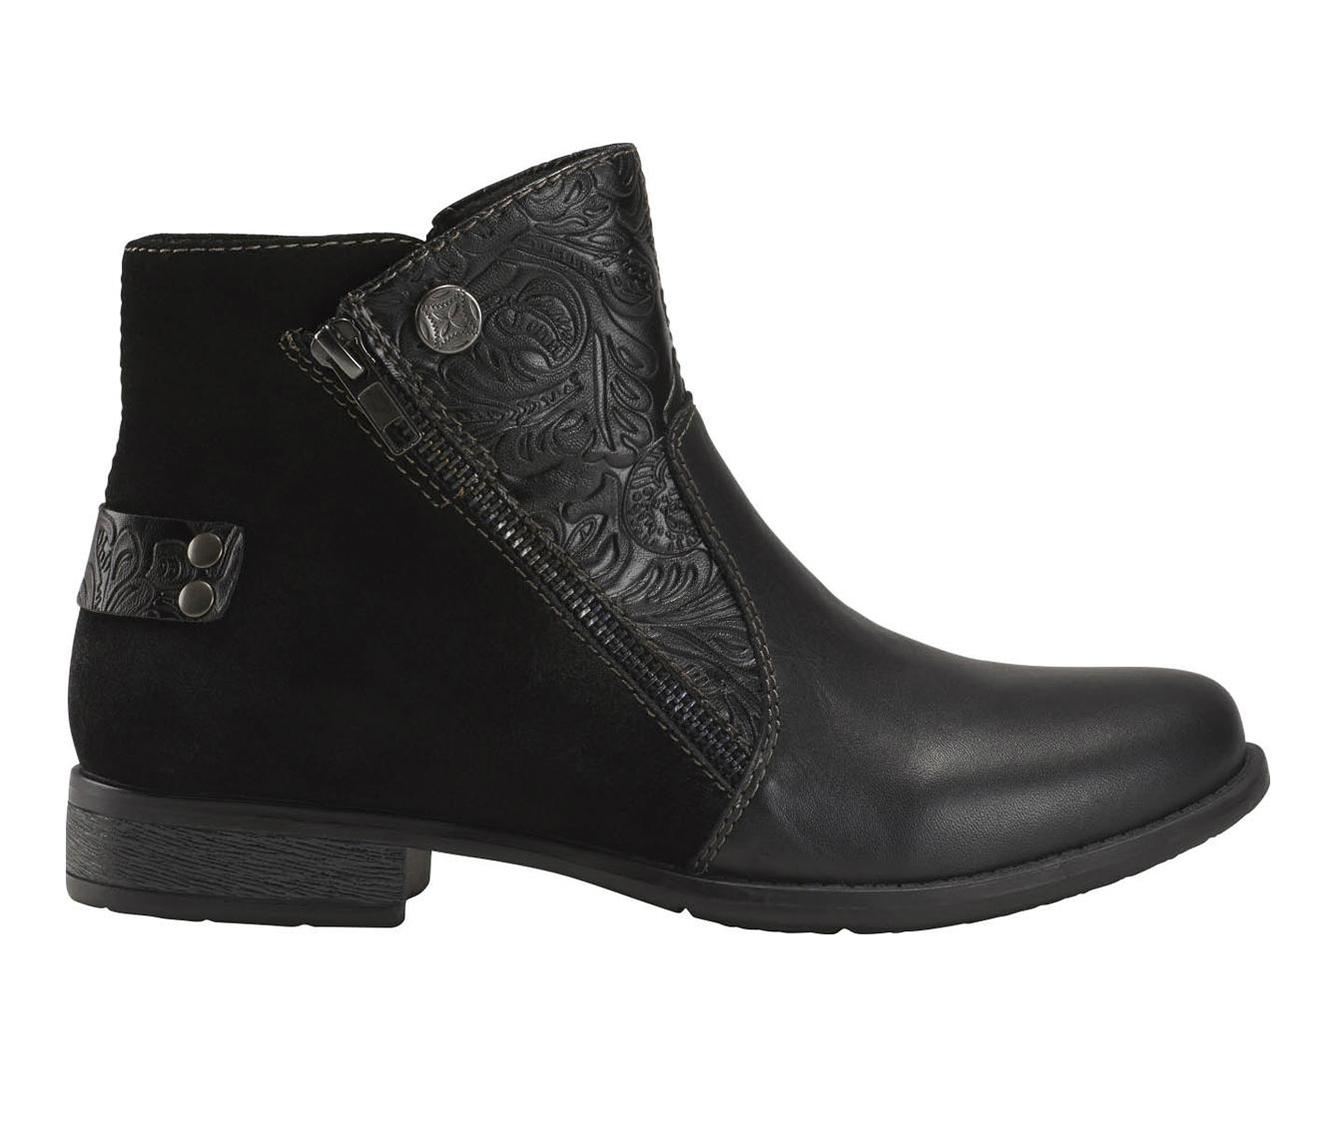 Earth Origins Navigate Noah Women's Boots (Black - Leather)